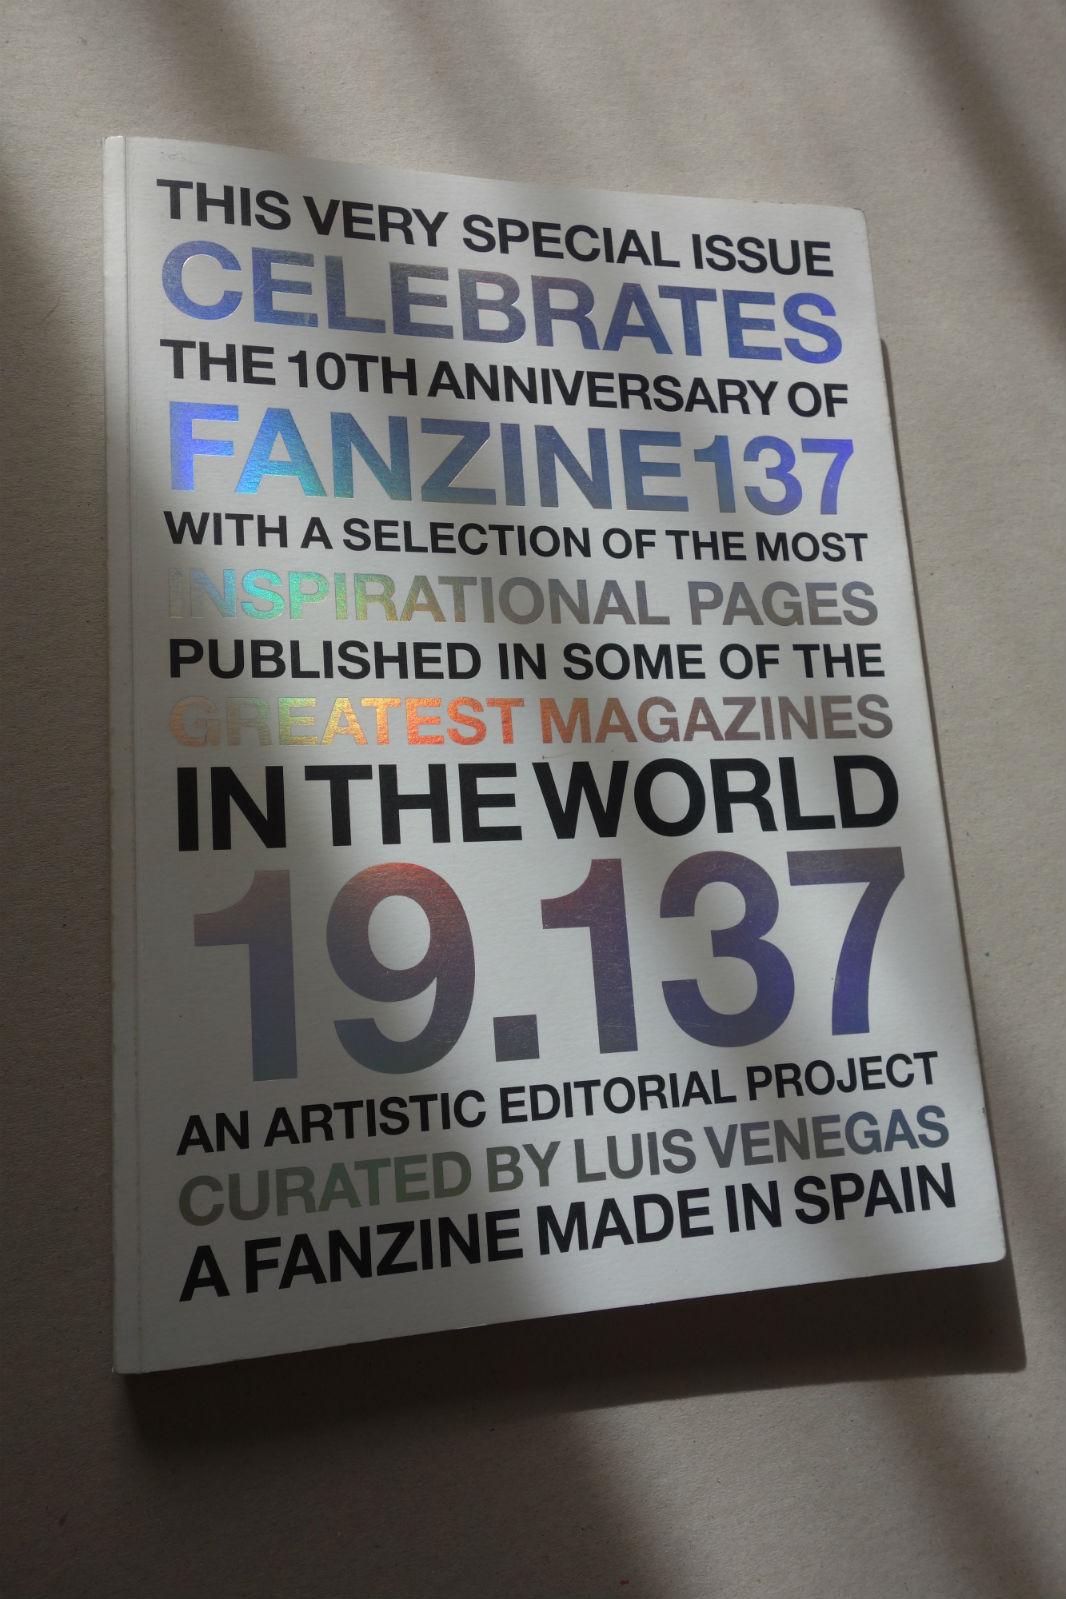 FANZINE137.jpg